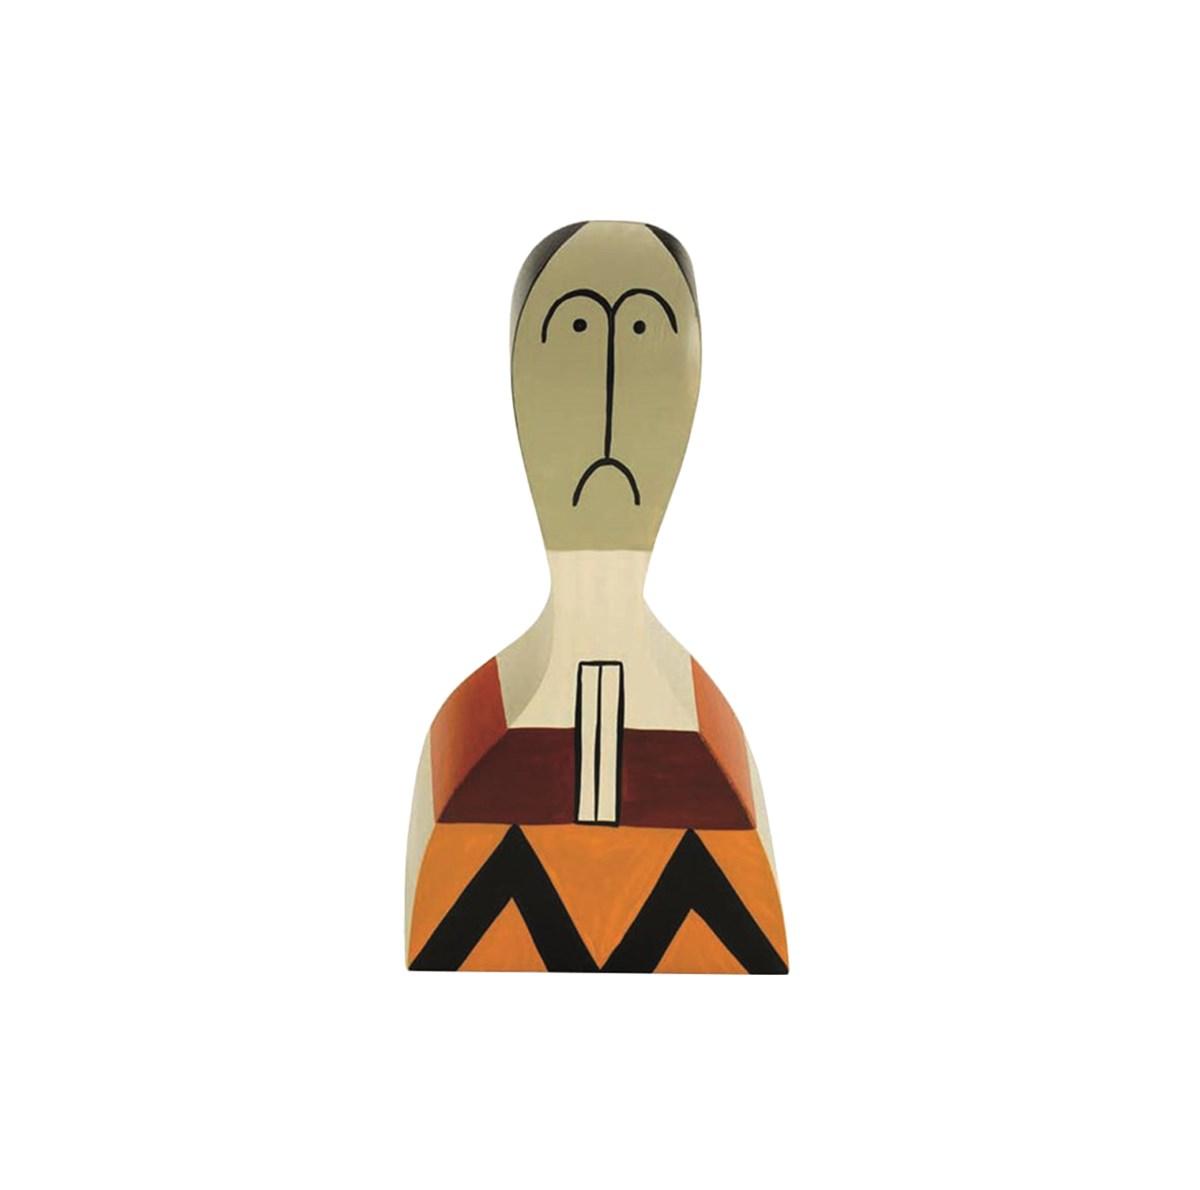 Vitra-Alexander-Girard-Wooden-Doll-No.17-Matisse-1